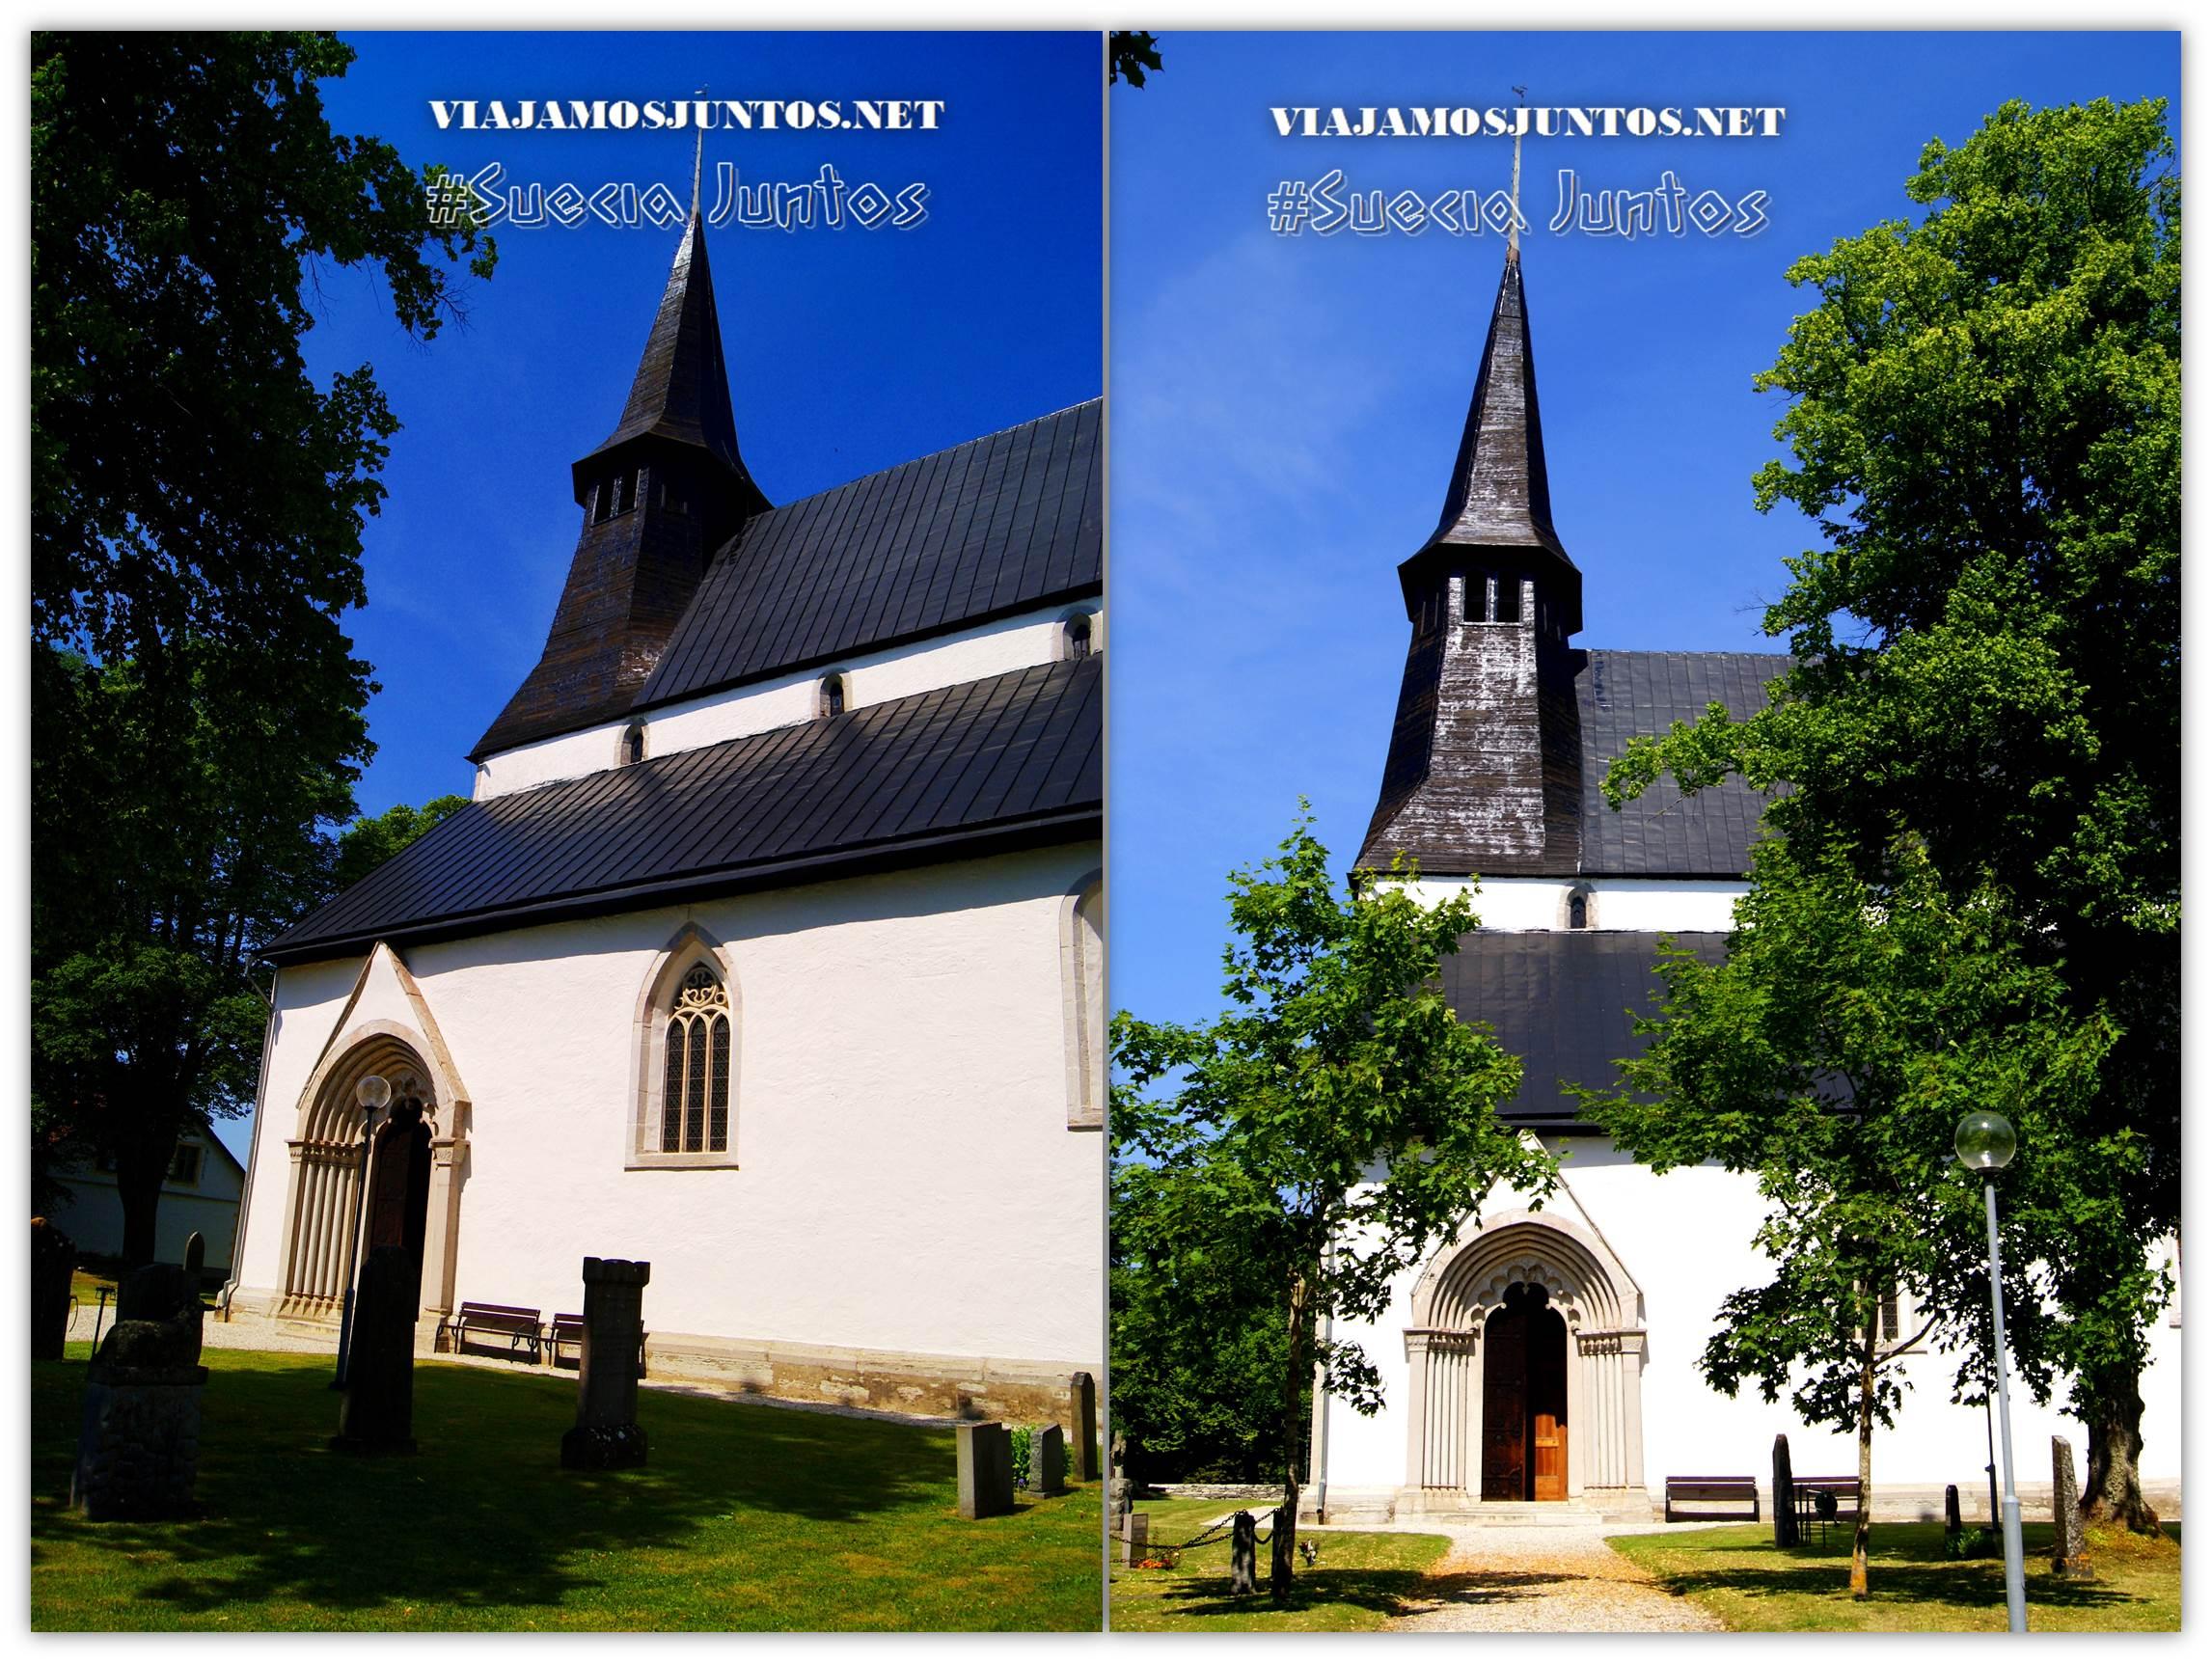 Iglesia de Roma, isla de Gotland. Suecia